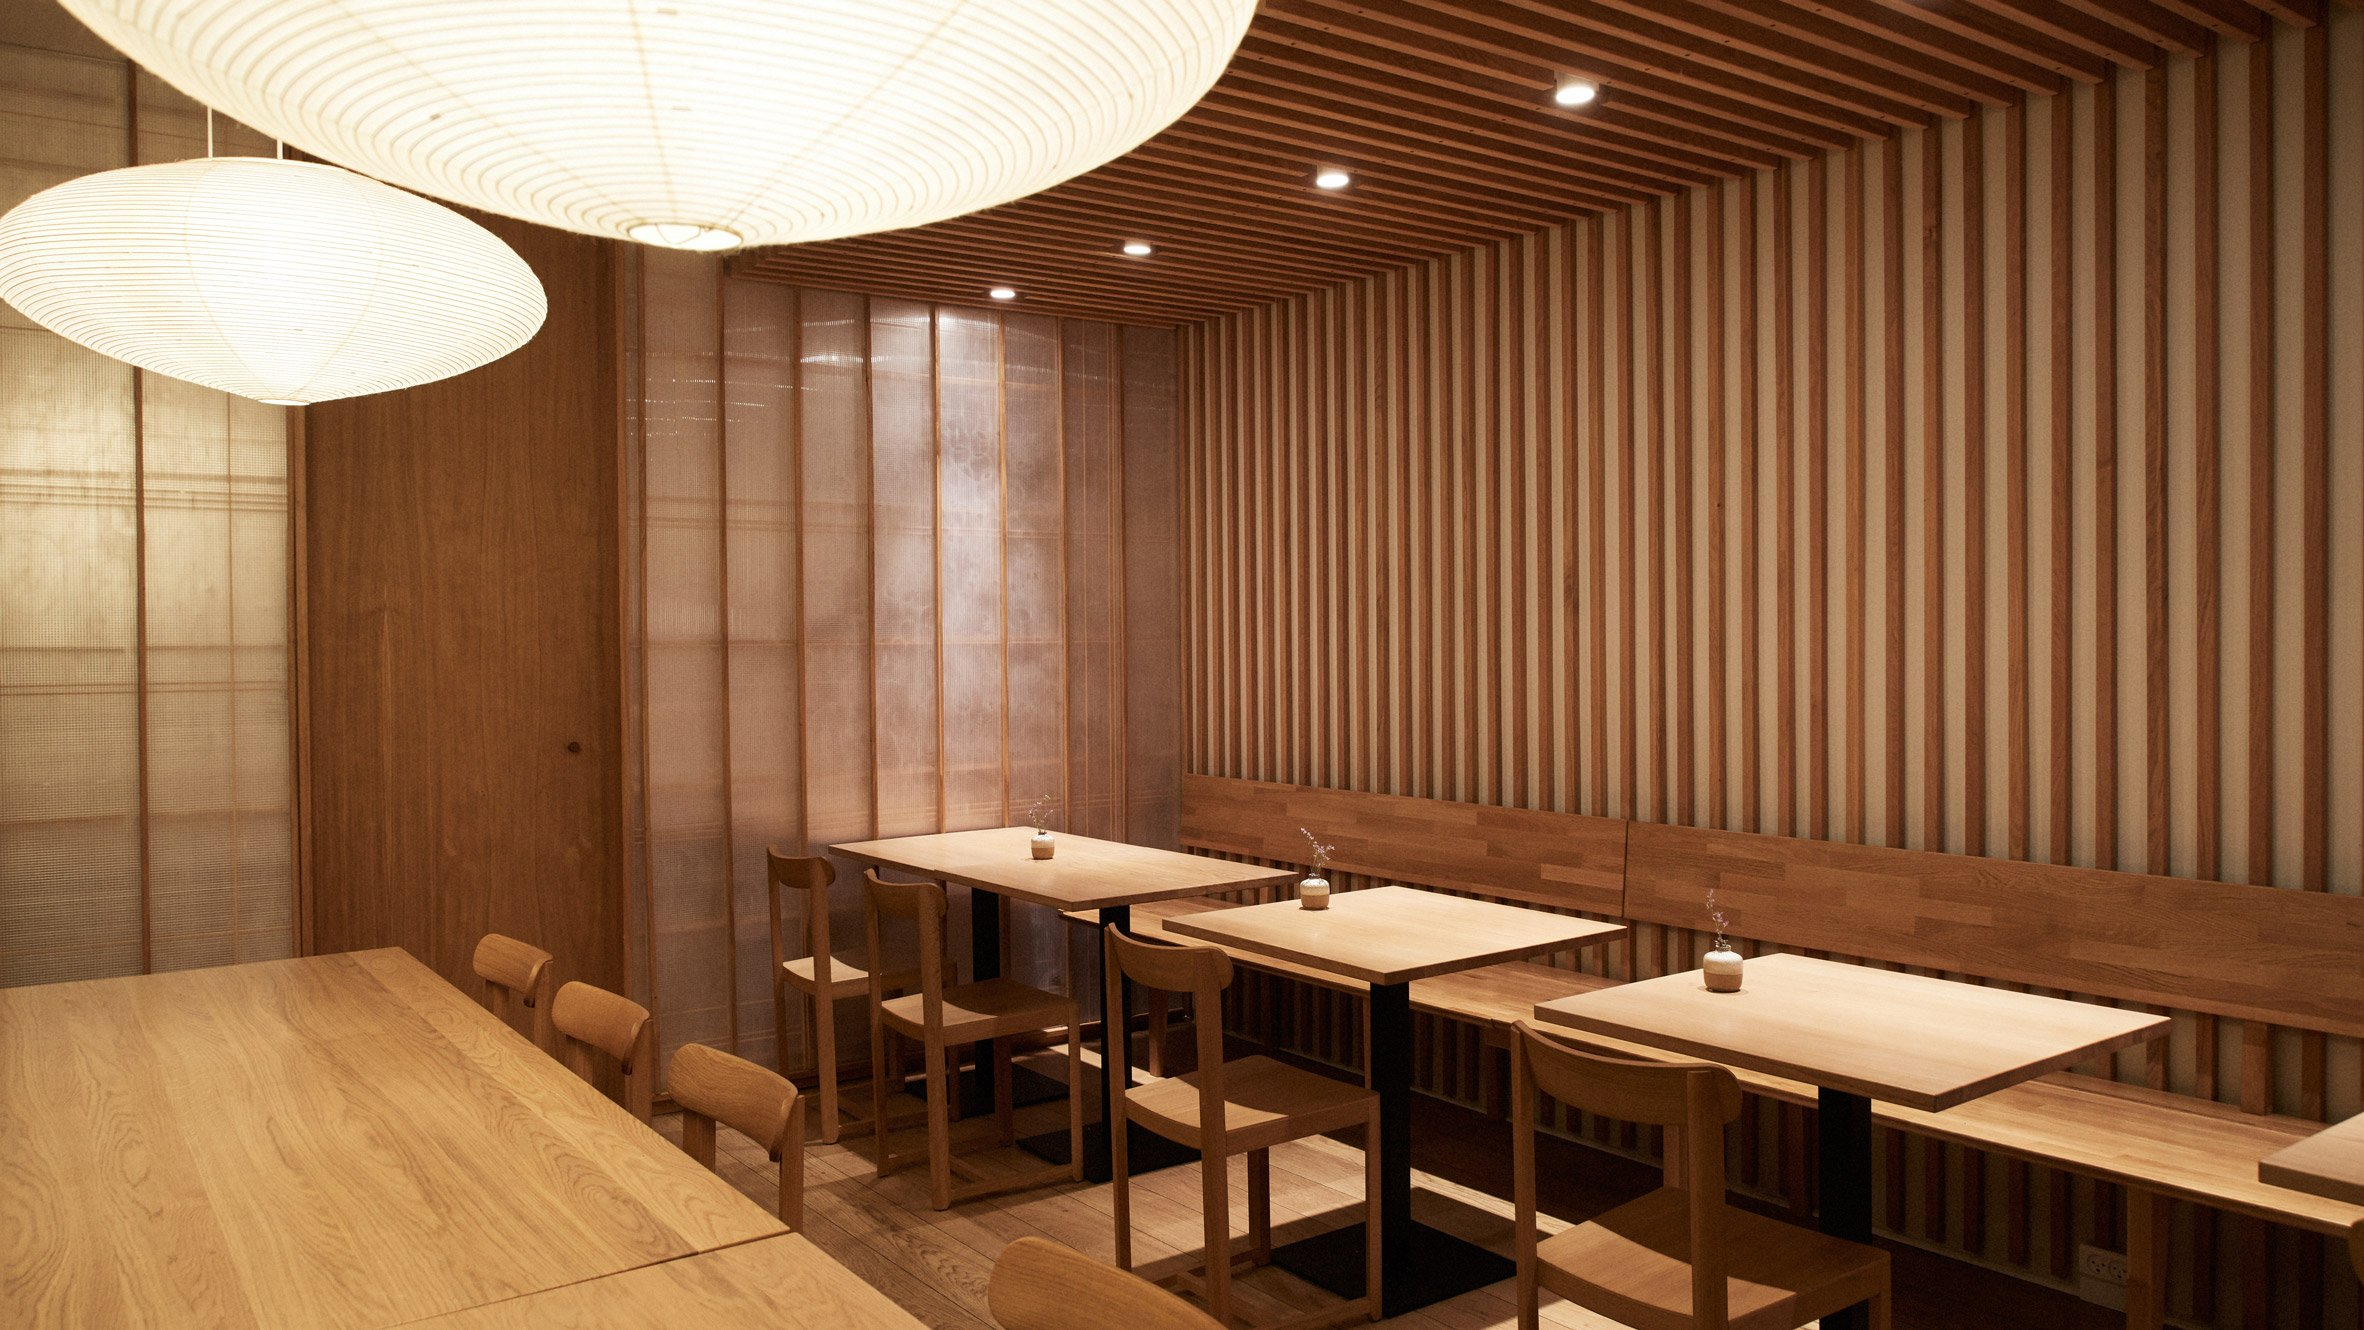 Izumi Charlottenlund restaurant design reflects its Nordic